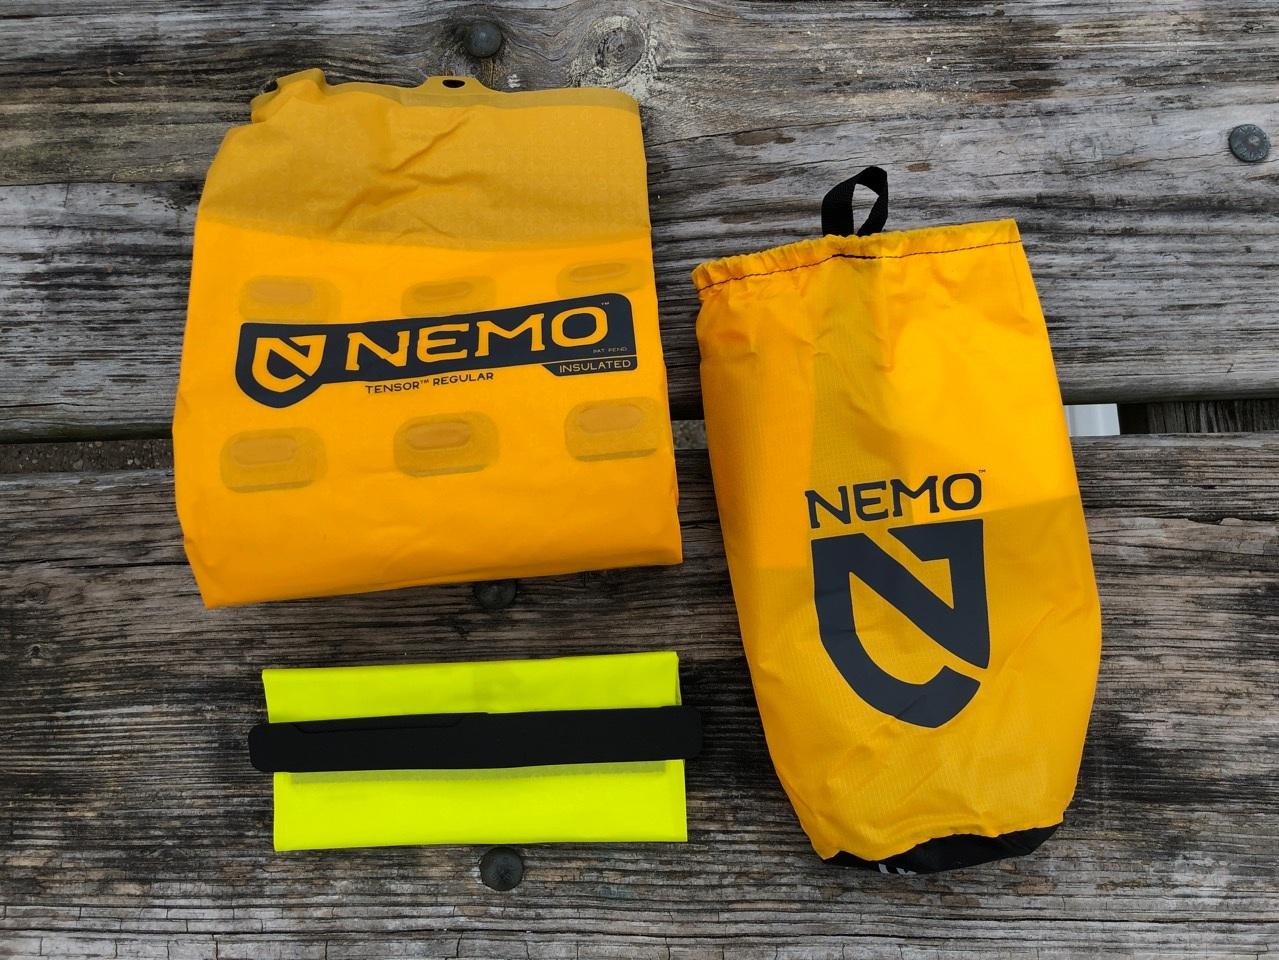 NEMO Tensor Regular Insulated Ultralight Sleeping Pad (2019) Unboxed